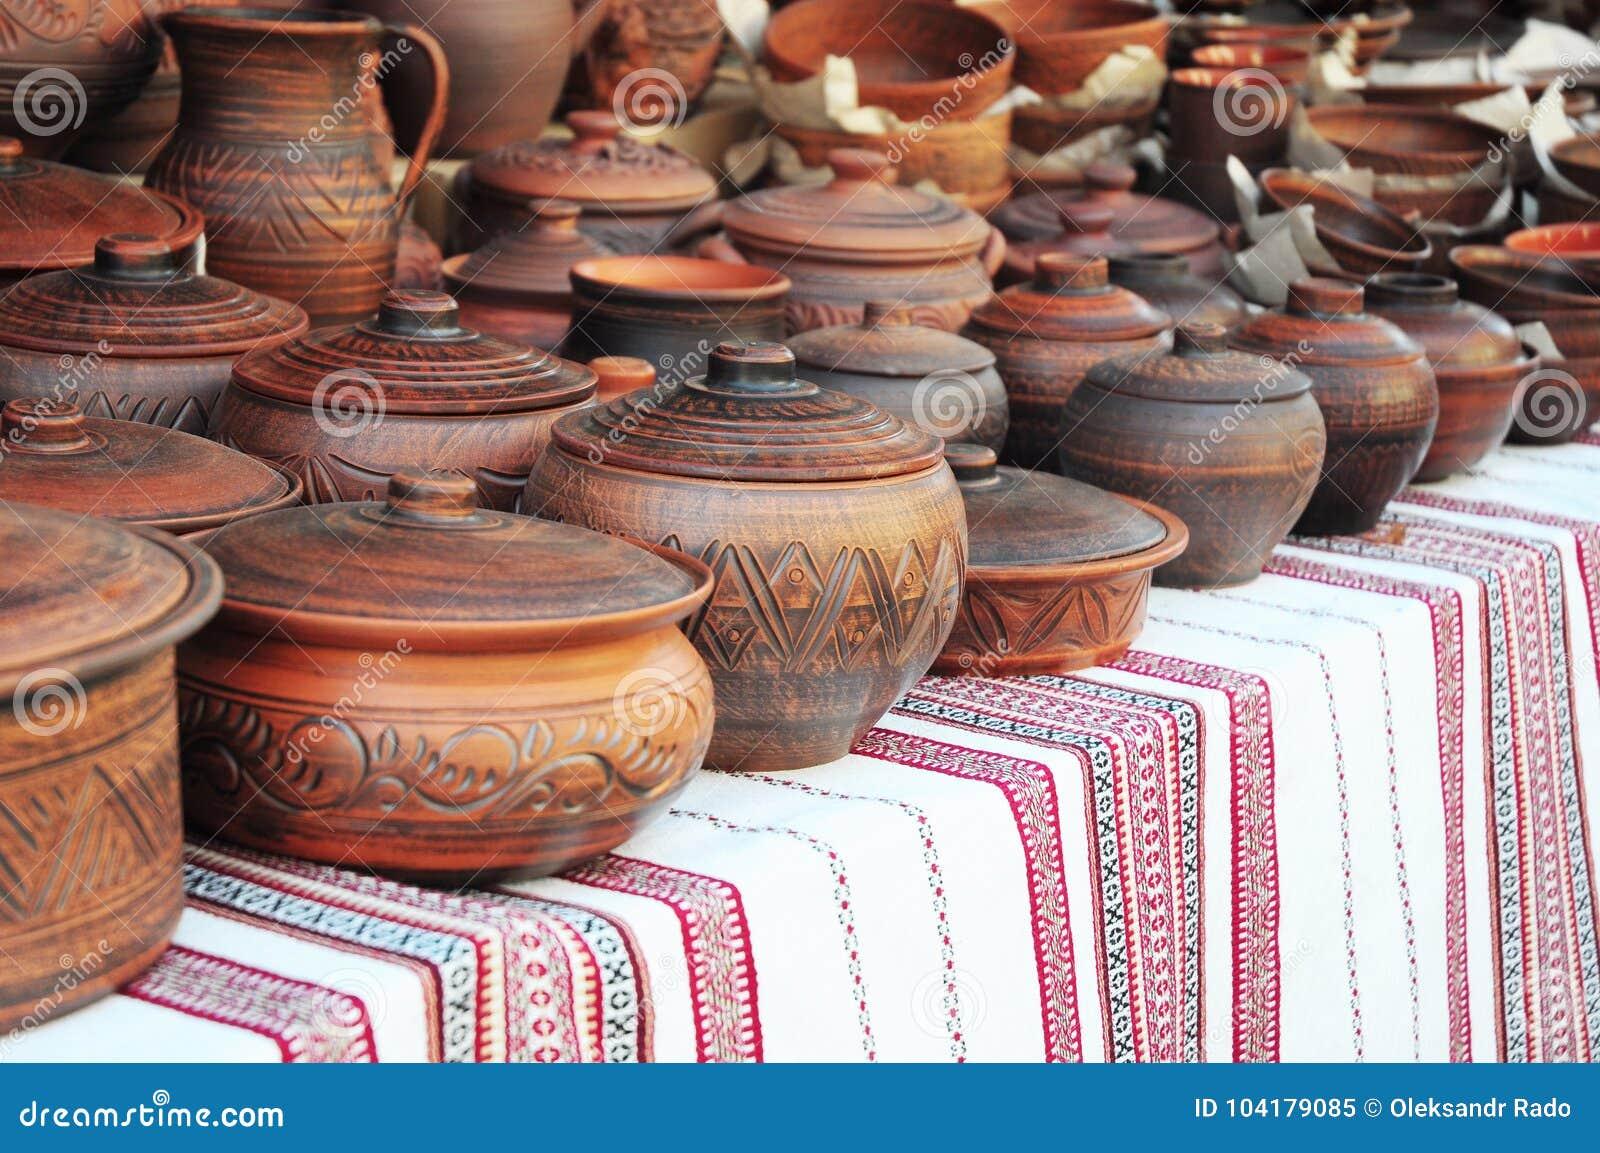 Handmade Pottery. Traditional Ceramic Jugs. Handmade Ceramic Pottery With Ceramic  Pots And Clay Plates. Stock Image - Image of still, outdoor: 104179085